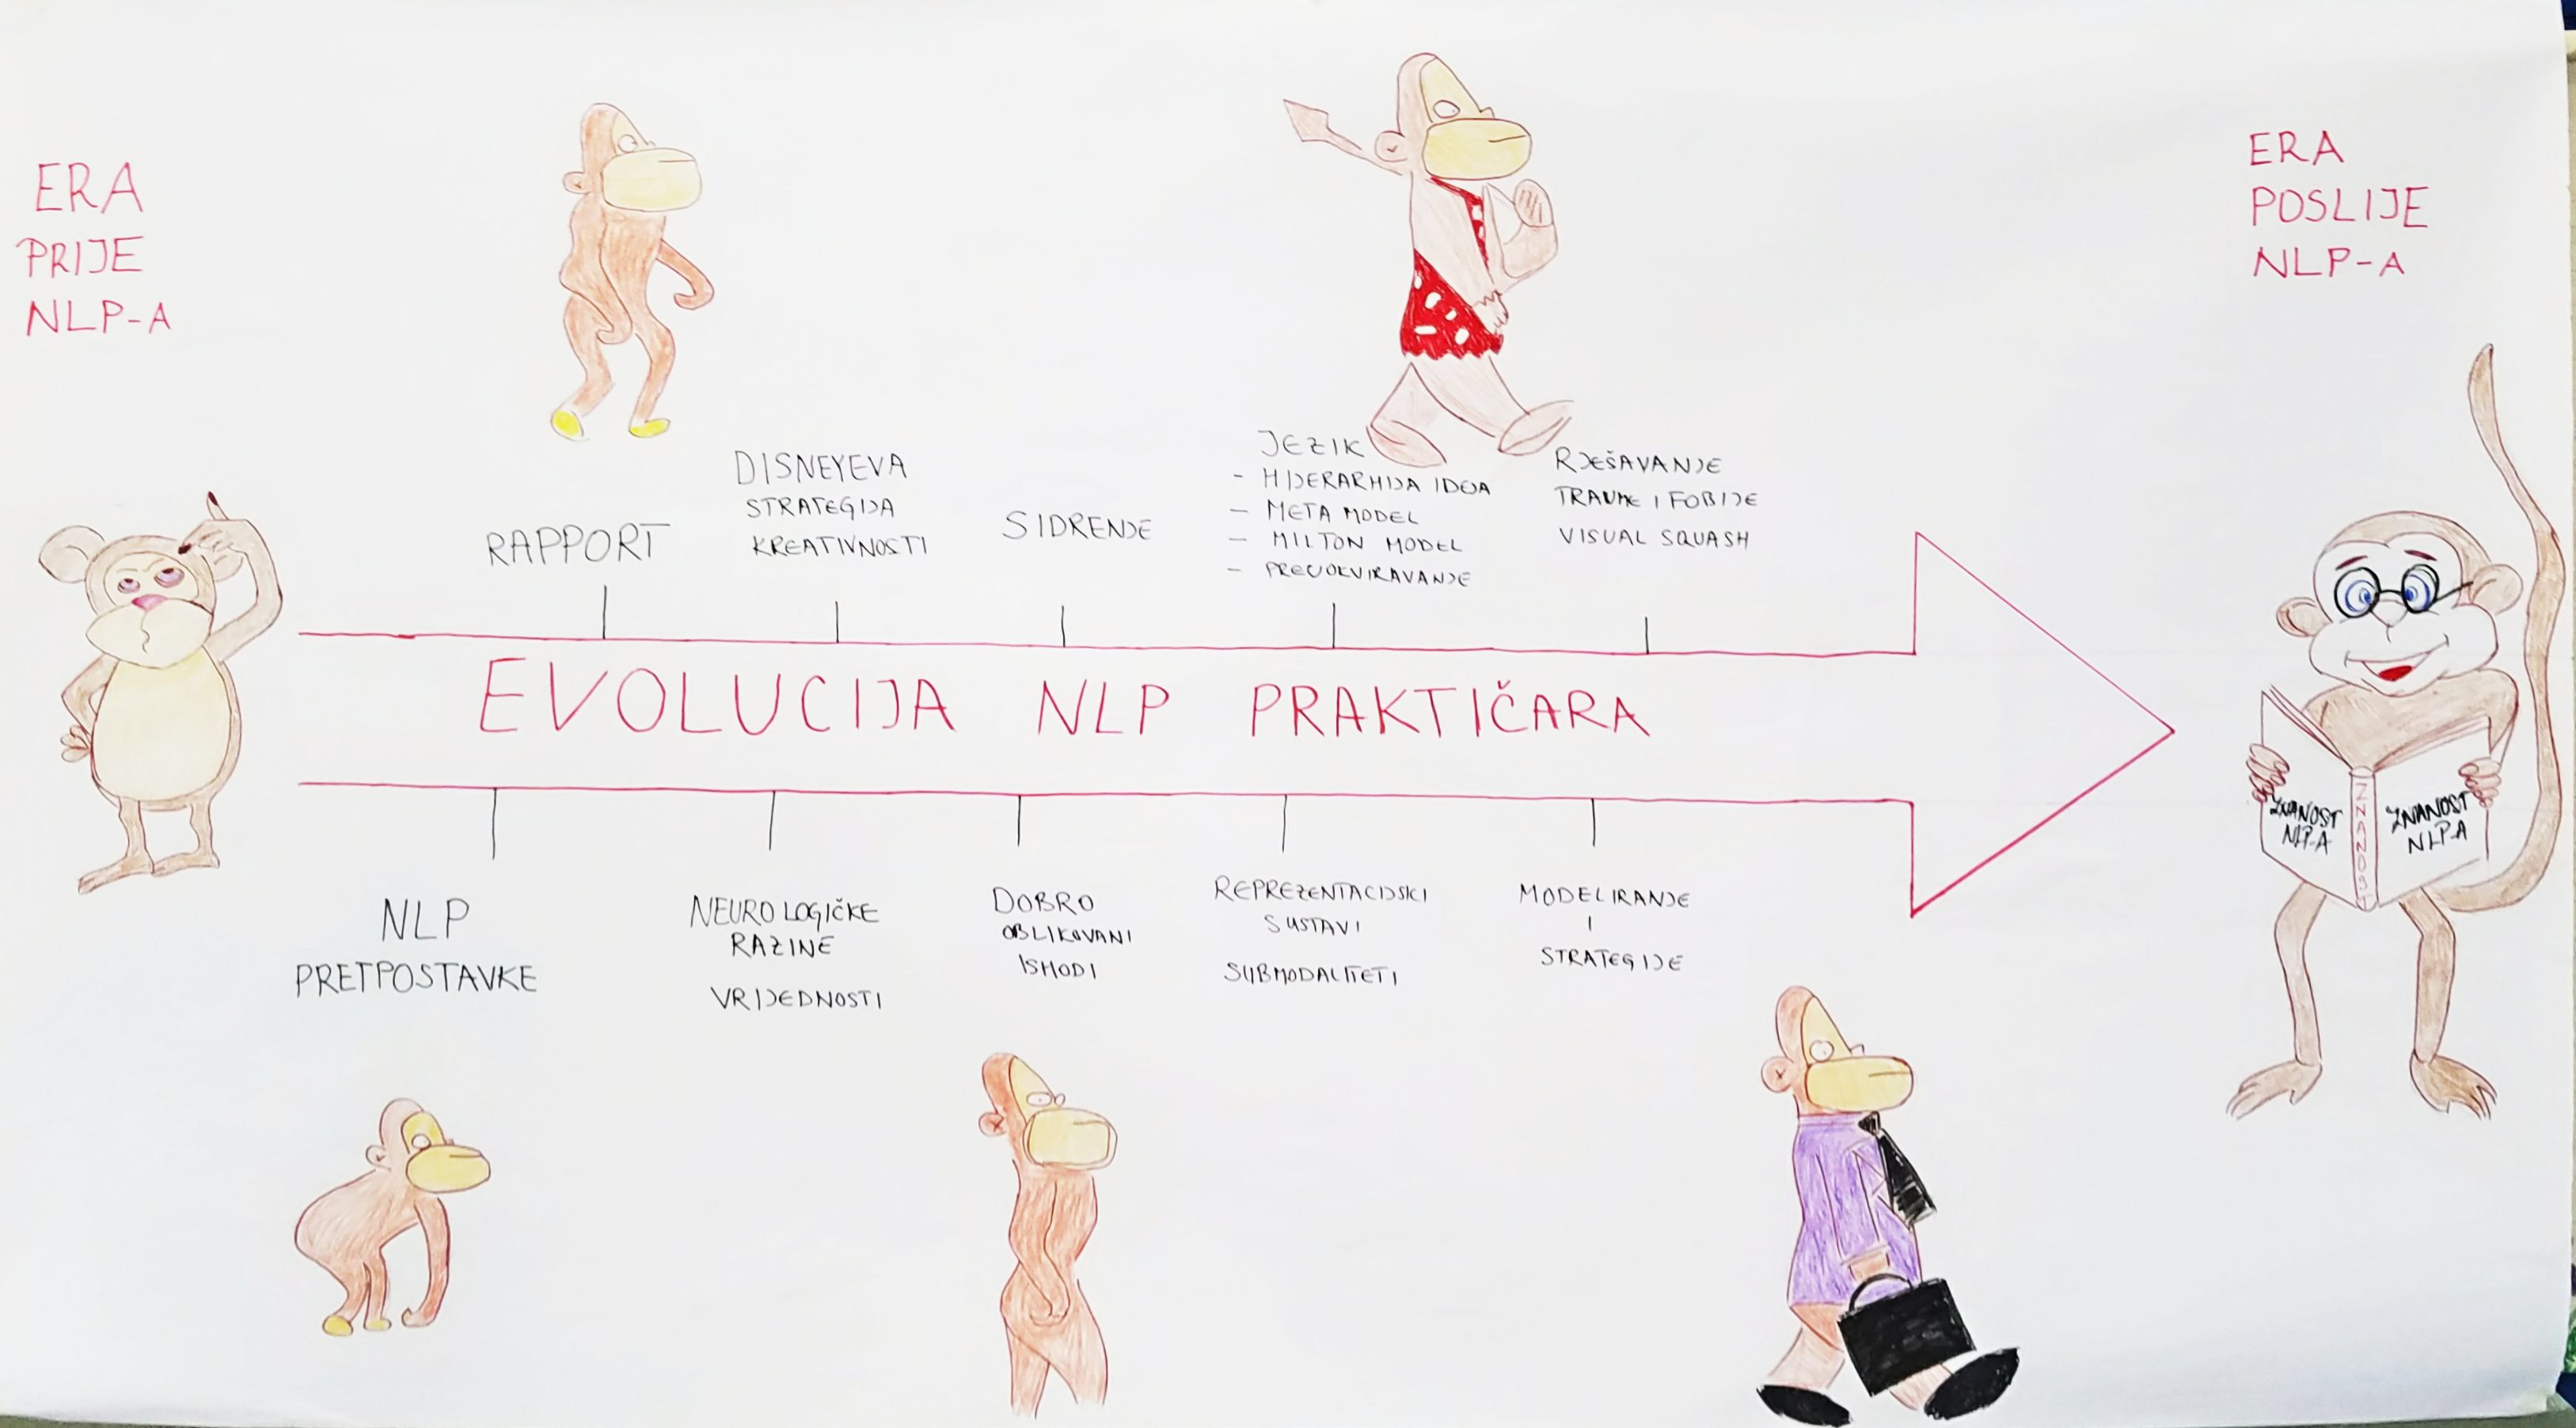 NLP evolucija 01